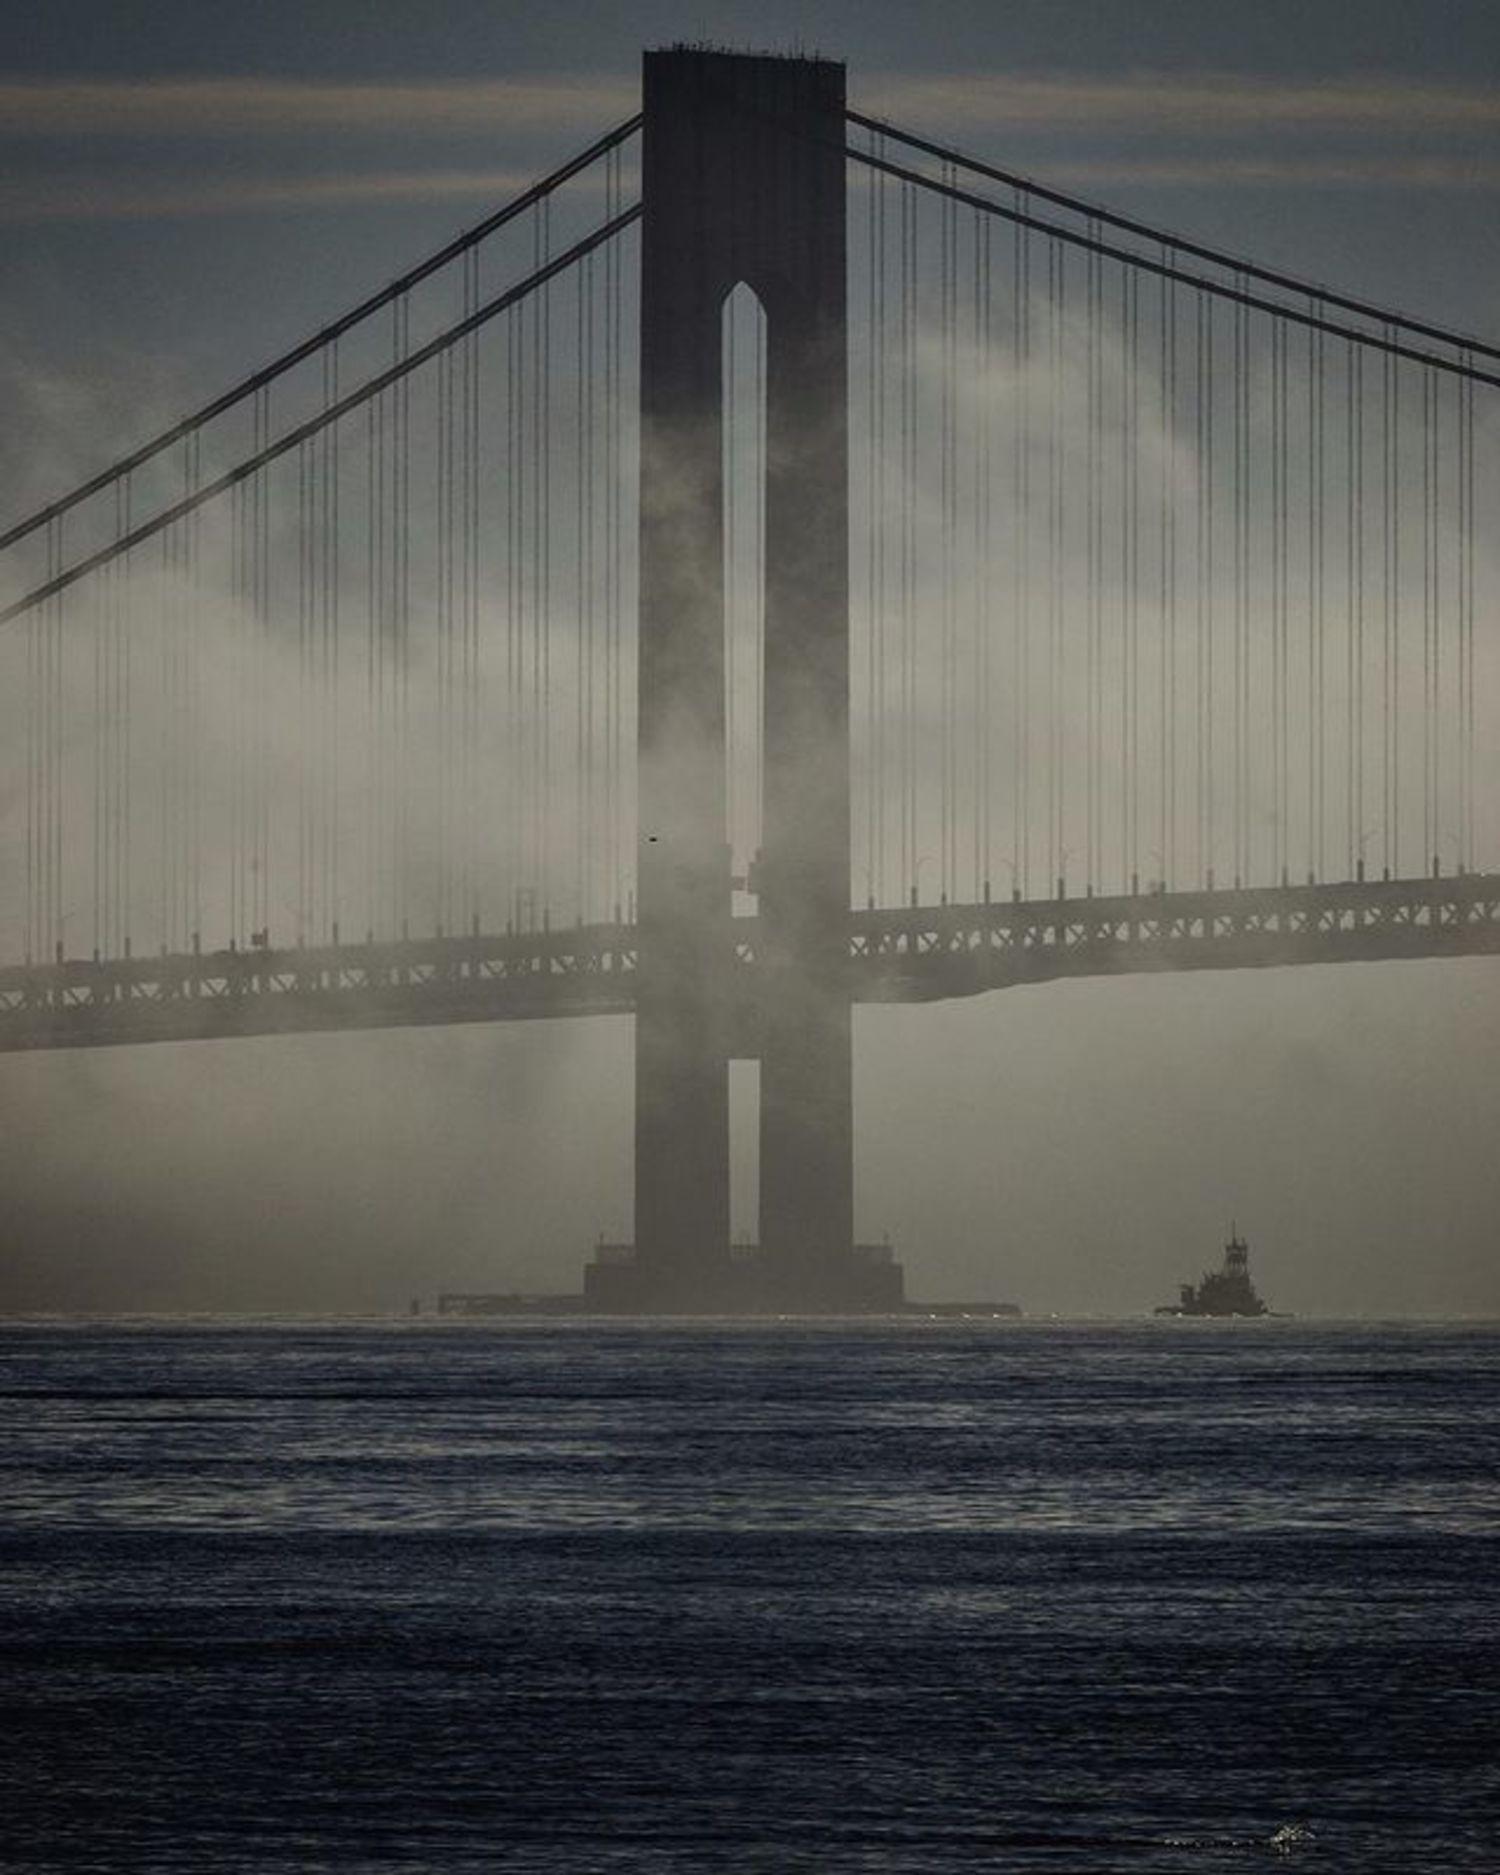 Verrazzano-Narrows Bridge, New York